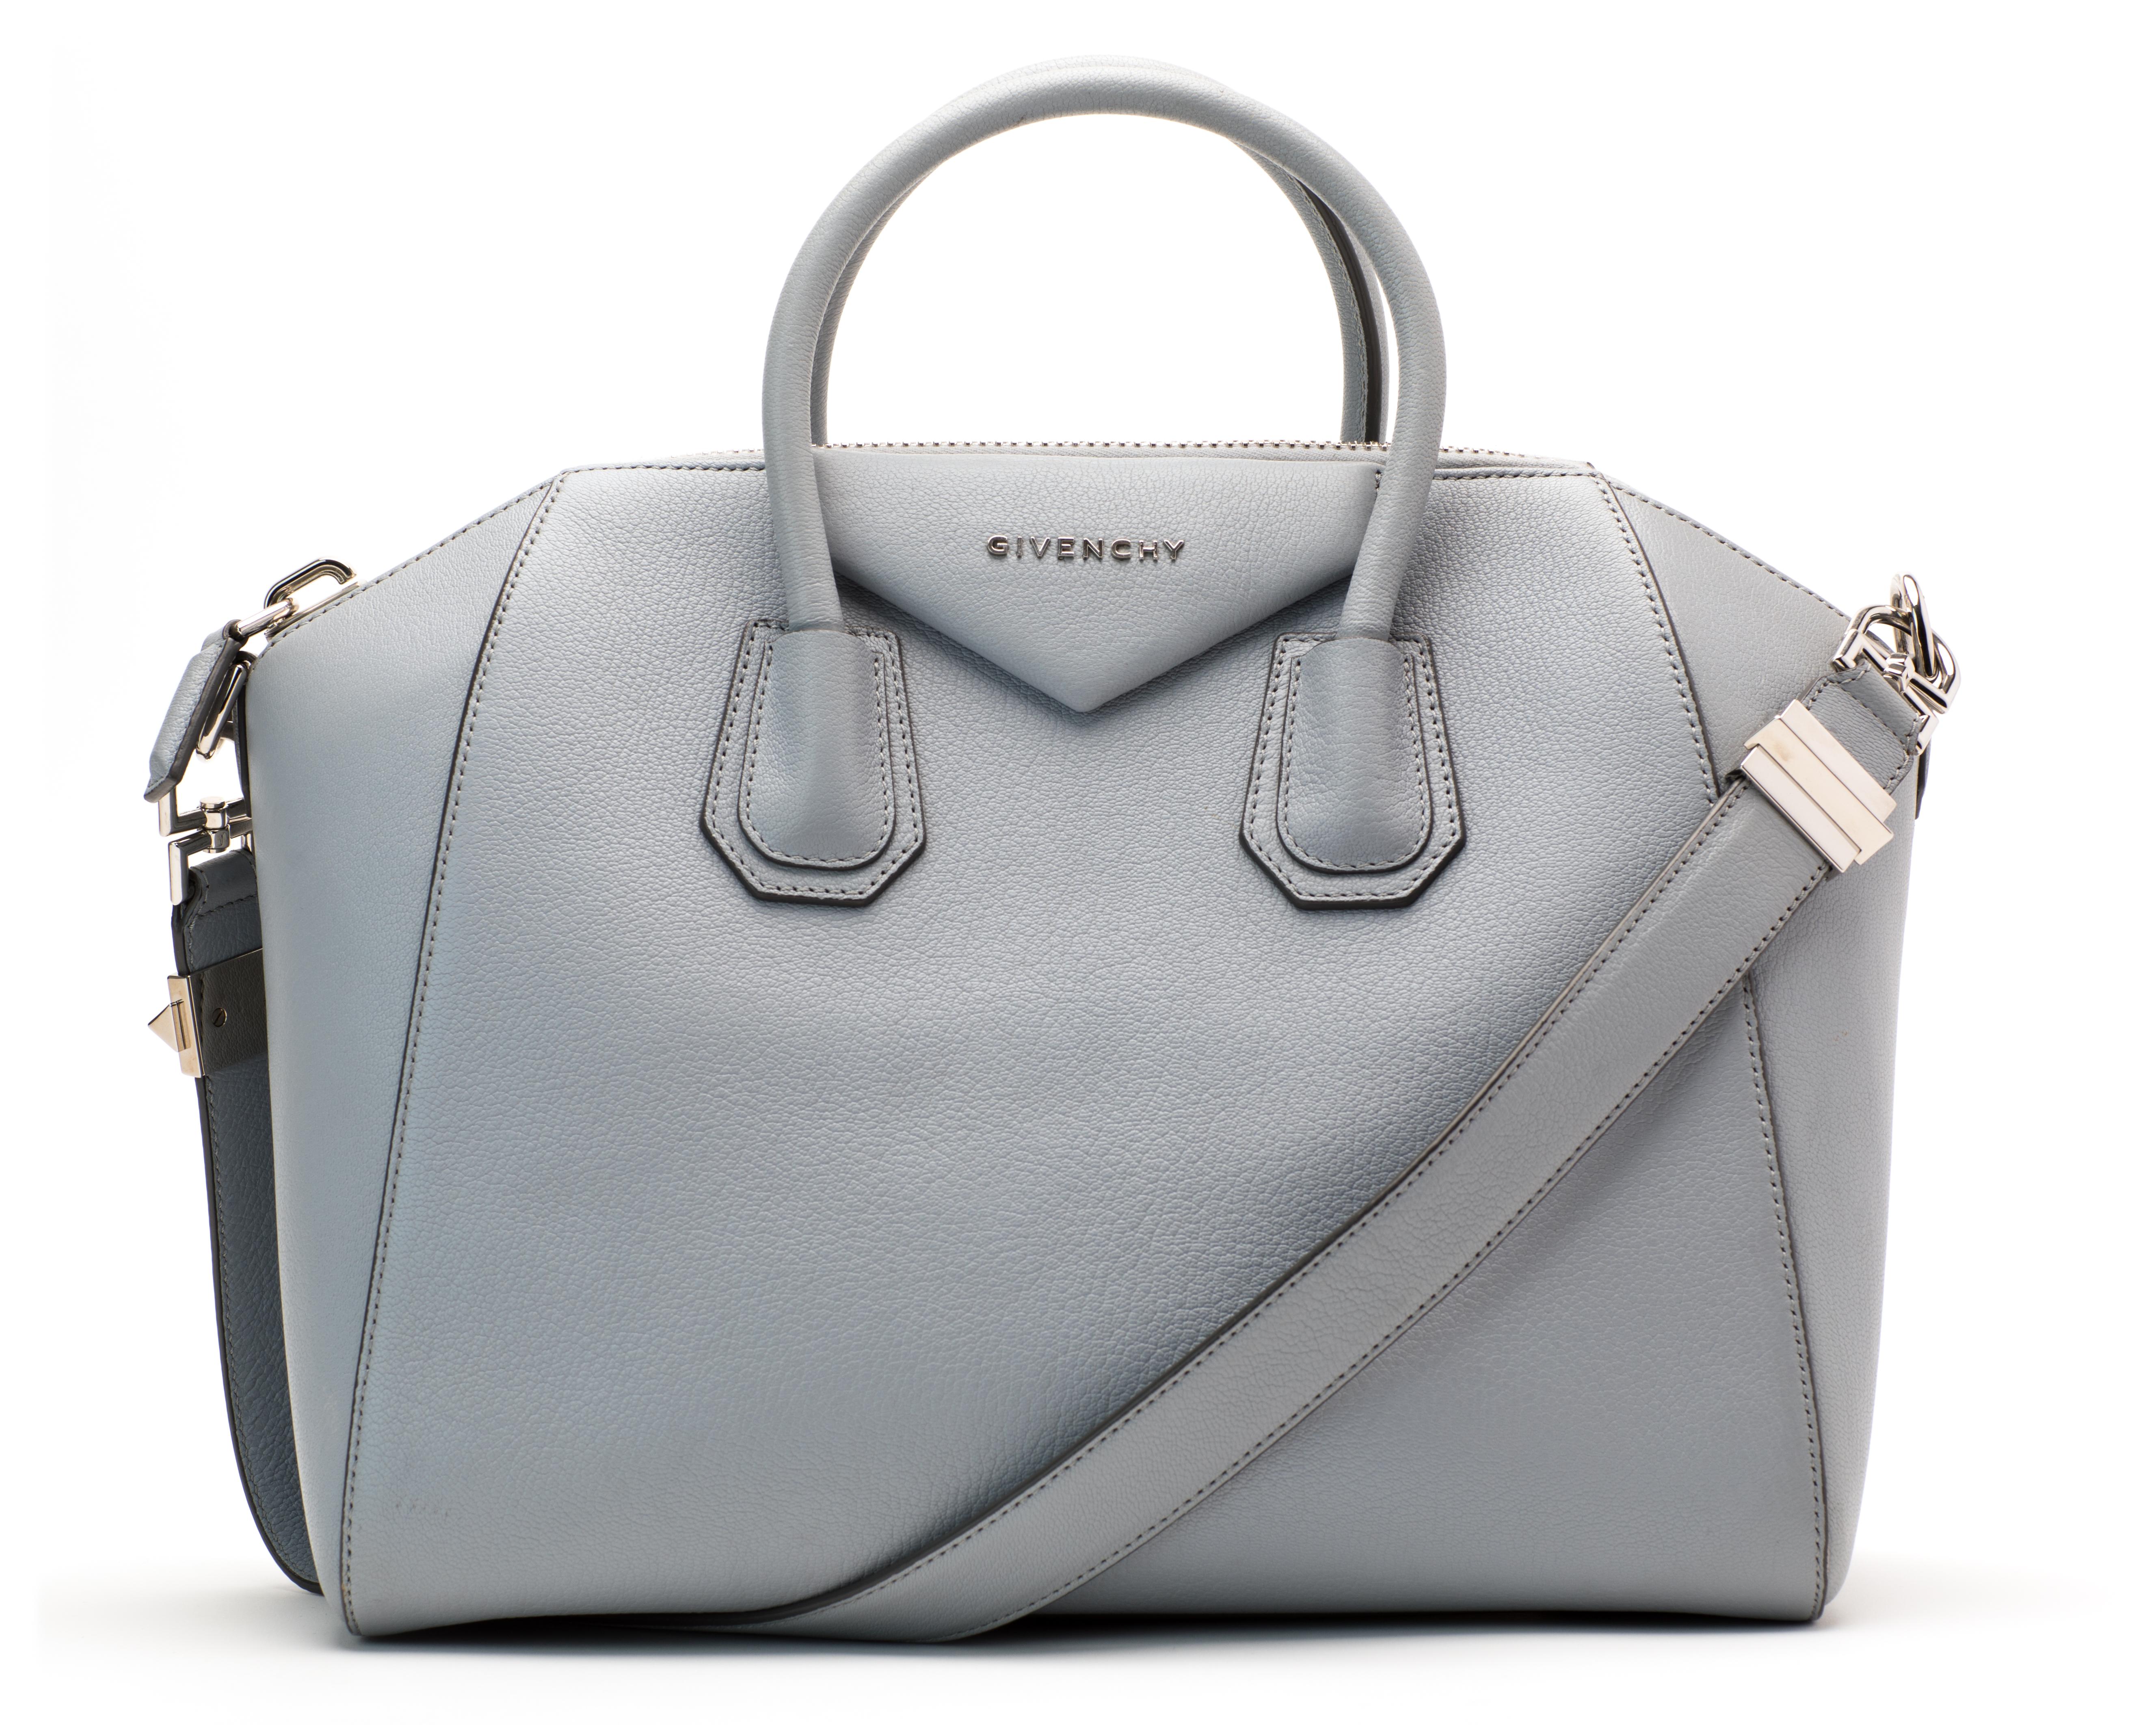 7d50de2b61 Givenchy antigona tote sugar goatskin medium grey blue jpg 1400x1000 Givenchy  handbags